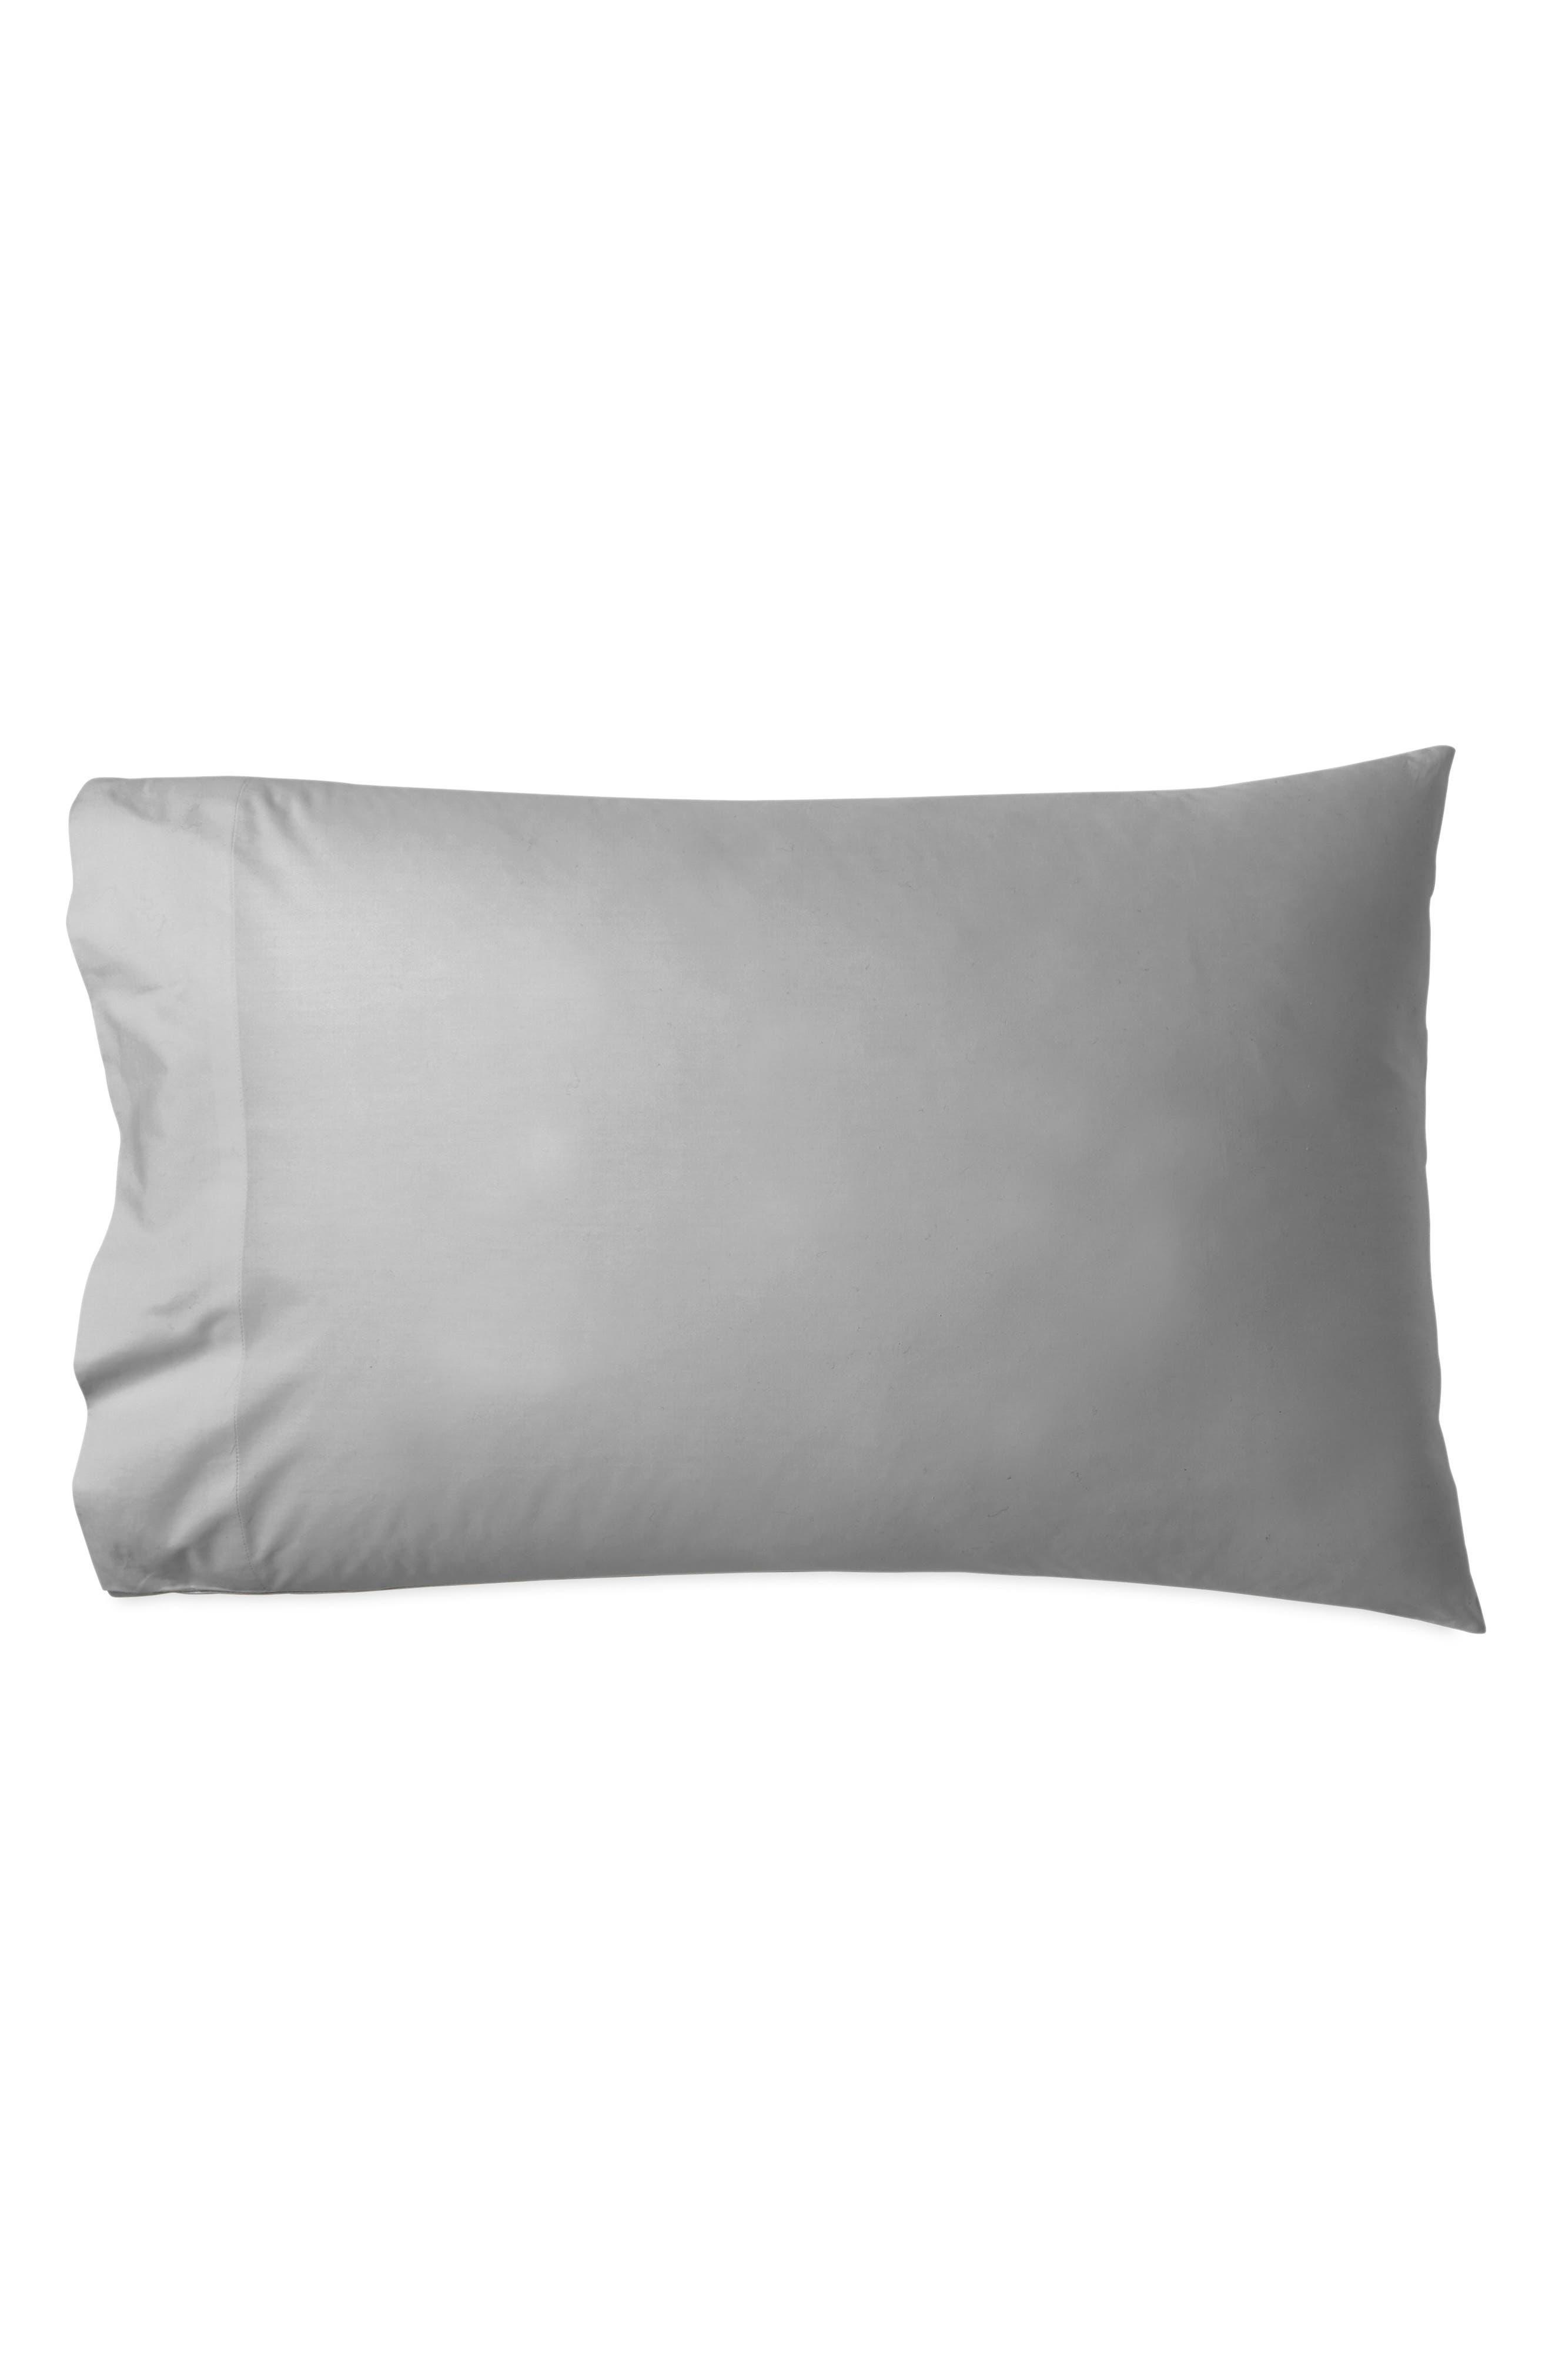 DONNA KARAN NEW YORK, Ultrafine 600 Thread Count Pillowcases, Main thumbnail 1, color, 020